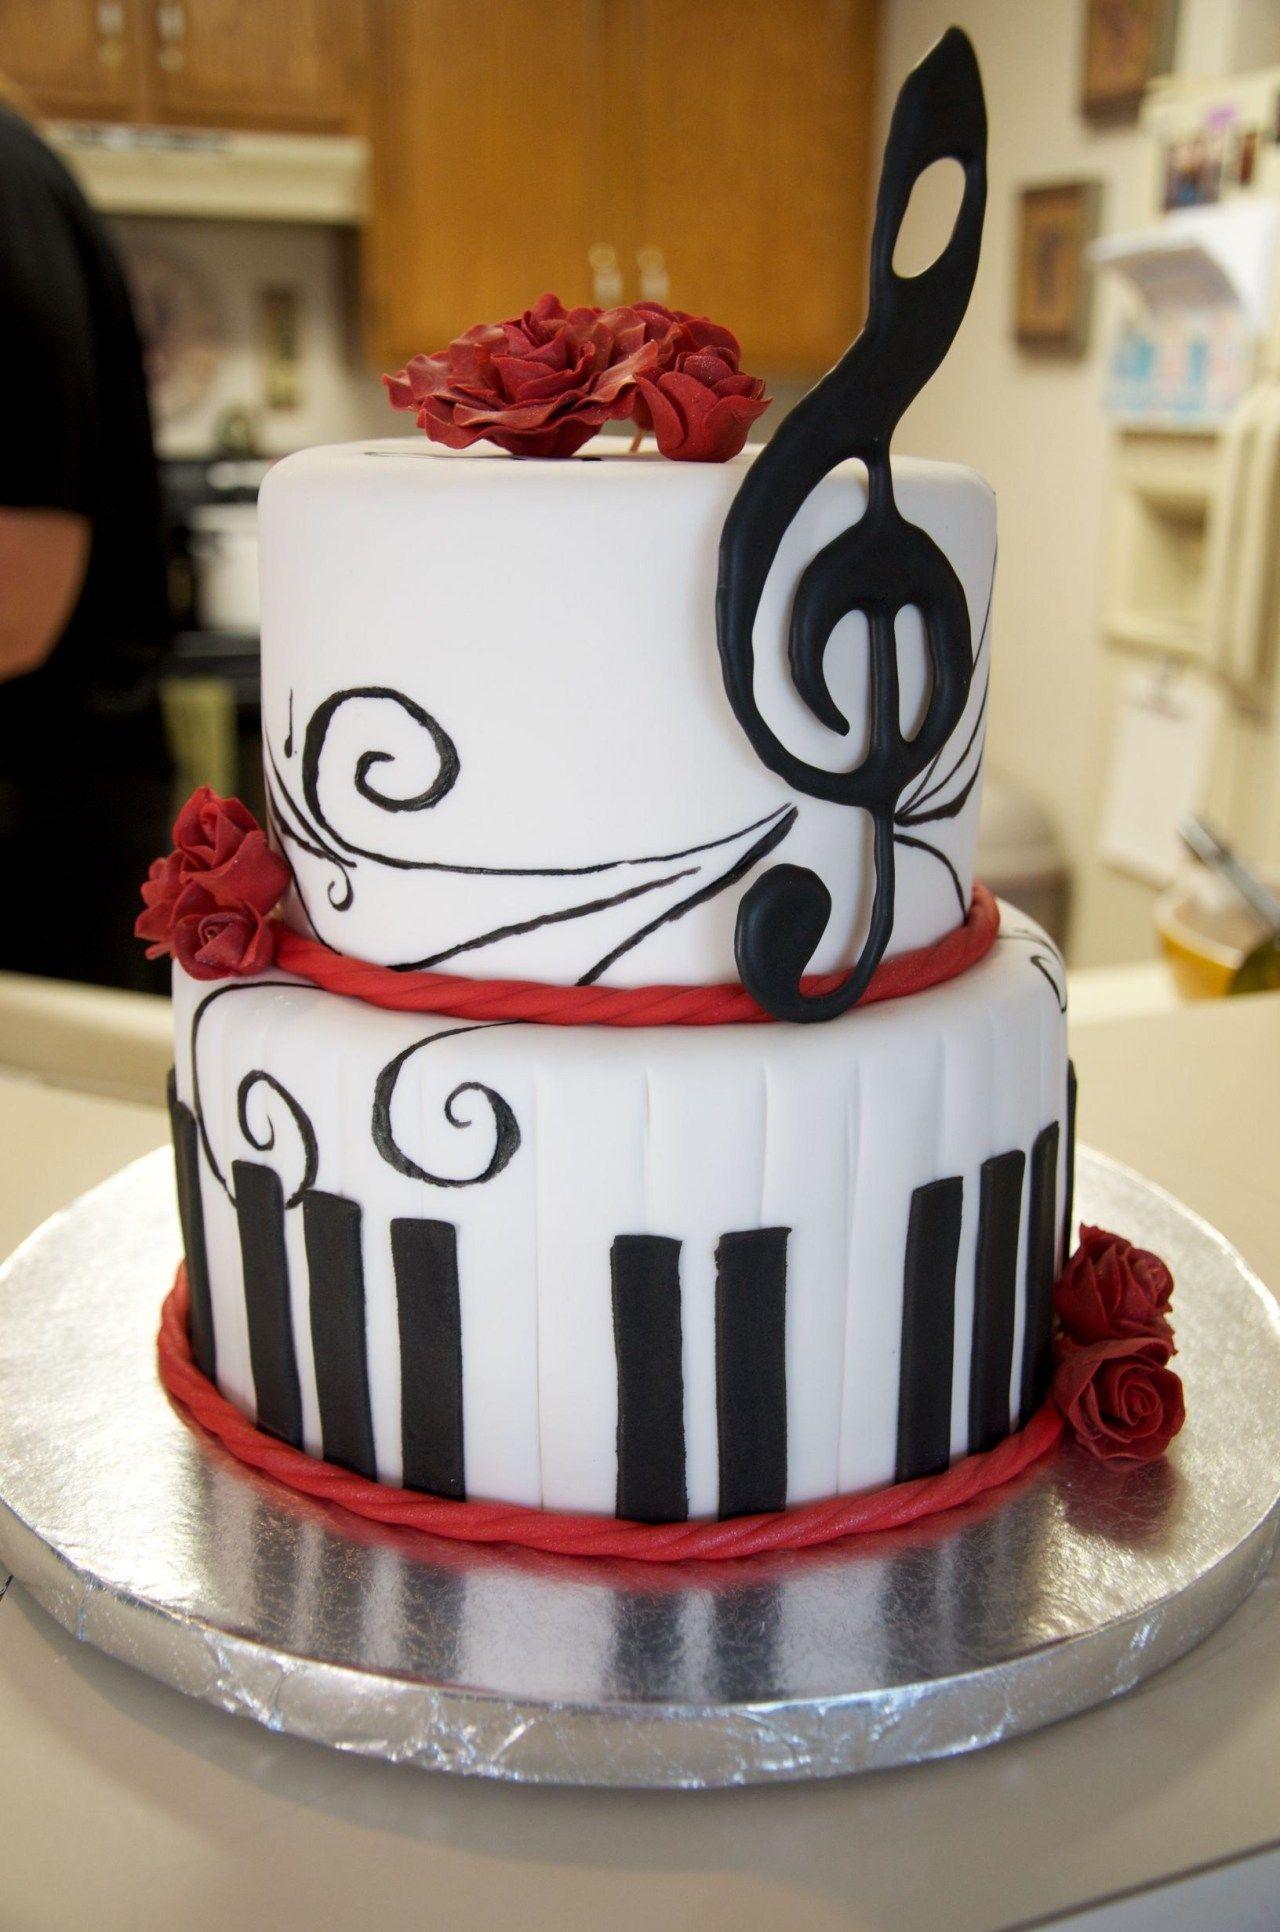 27 Great Image Of Piano Birthday Cake